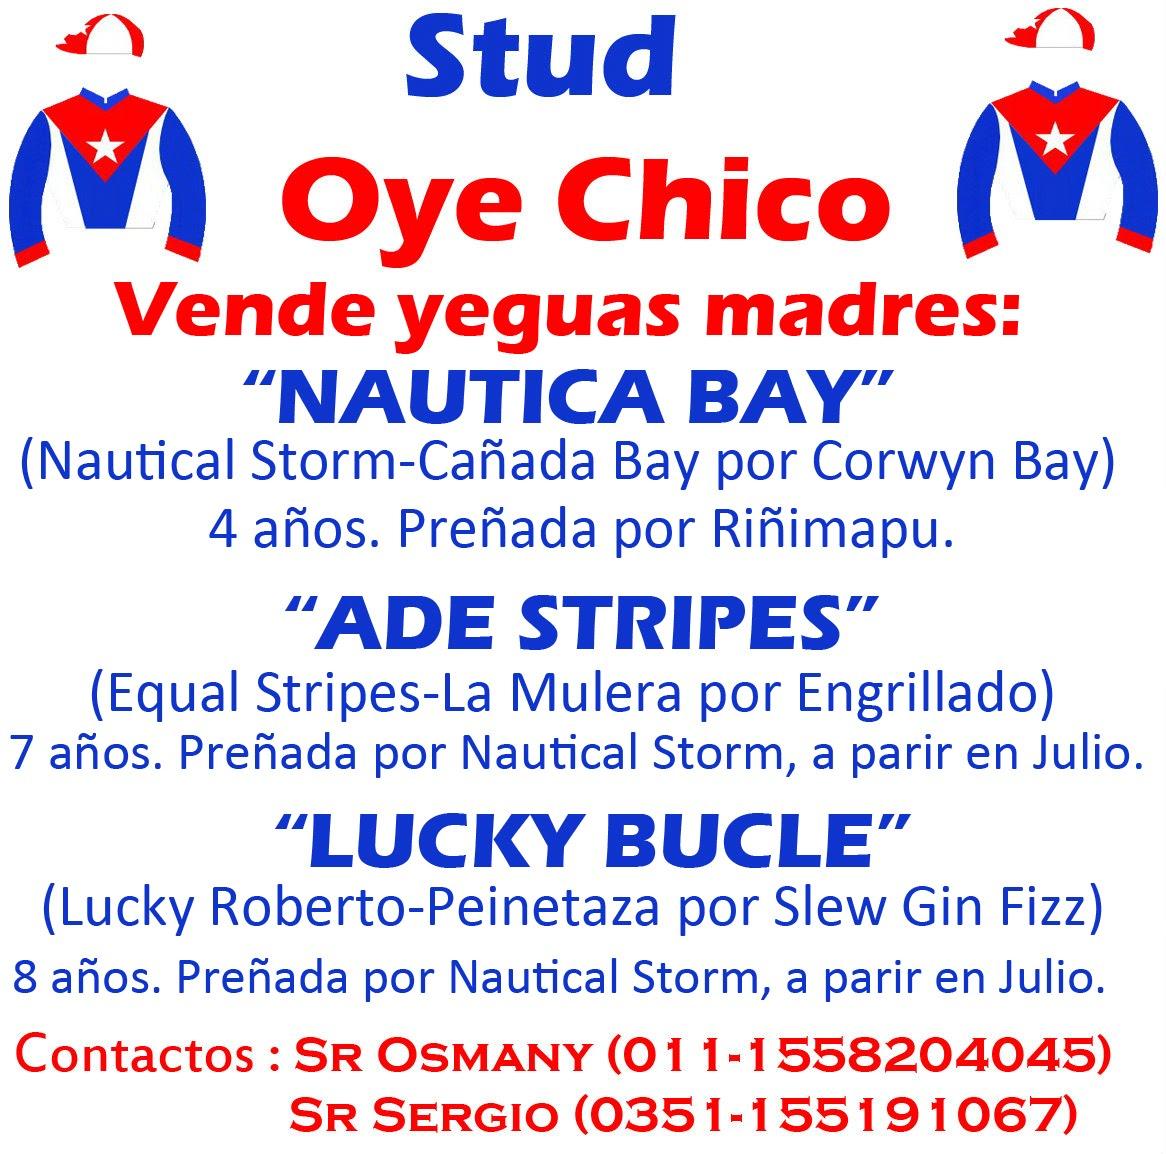 OYE CHICO 3